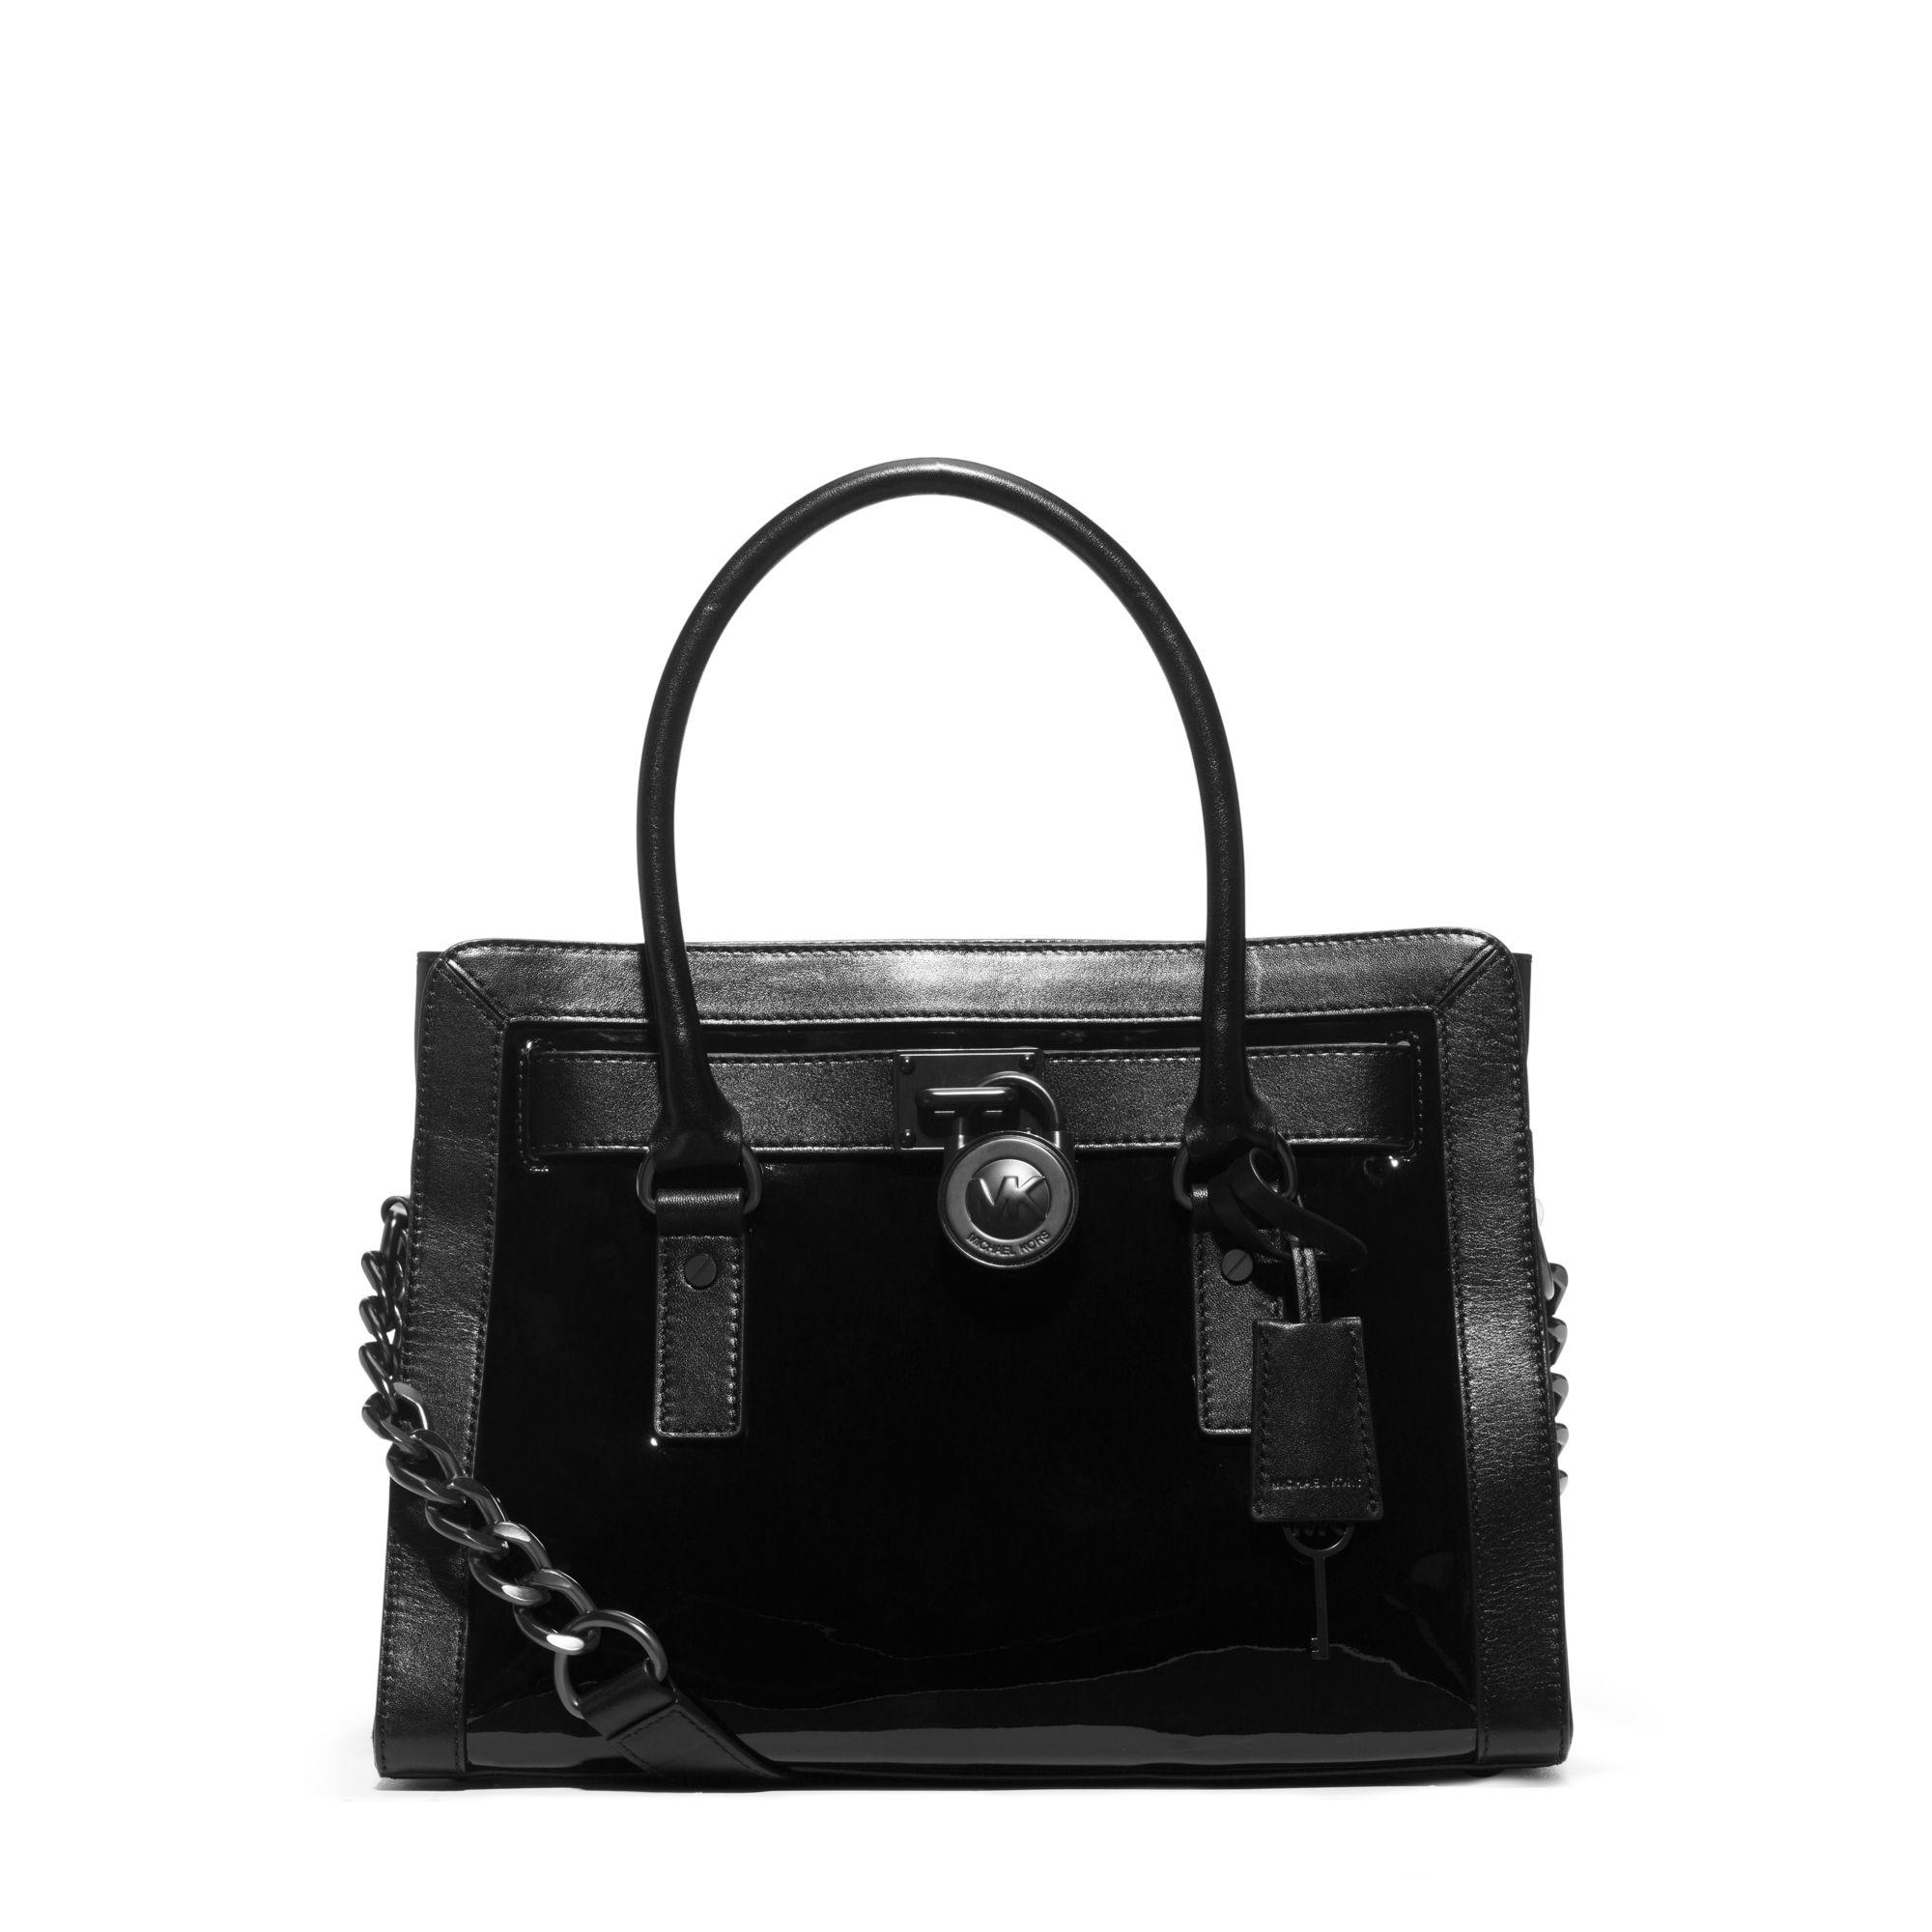 Michael kors Hamilton Patent-leather Satchel in Black | Lyst